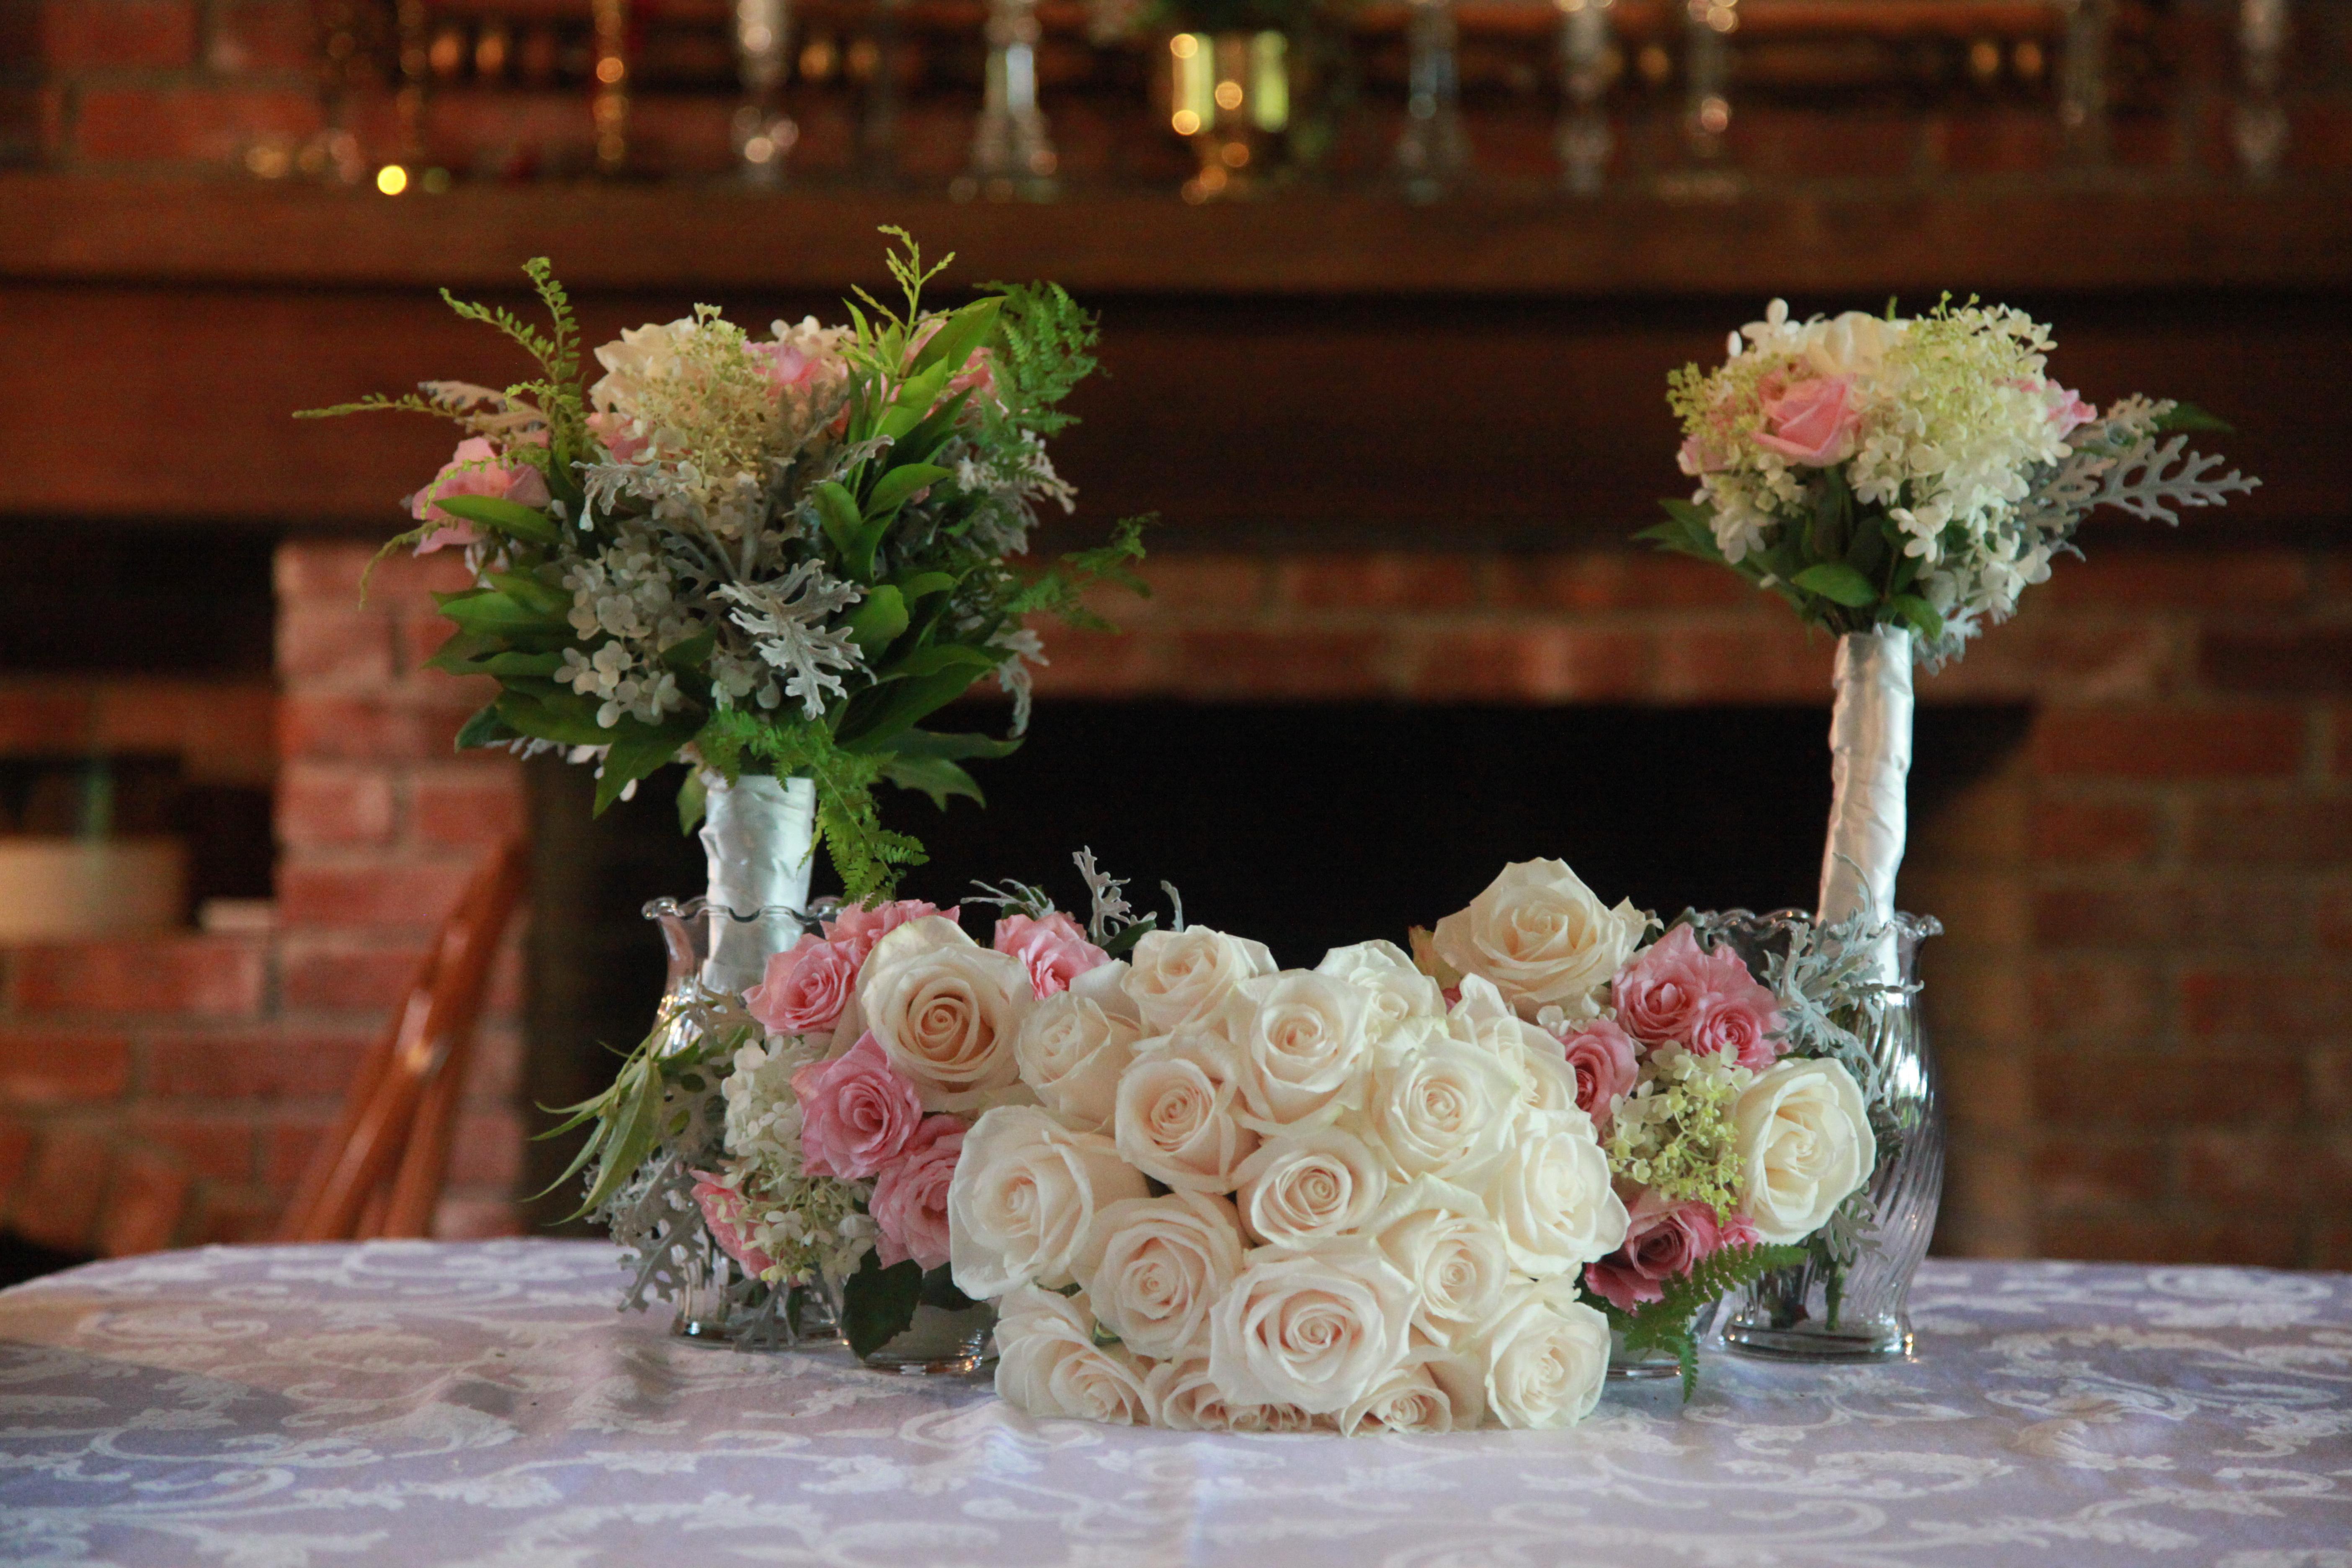 Wedding Flower Displays